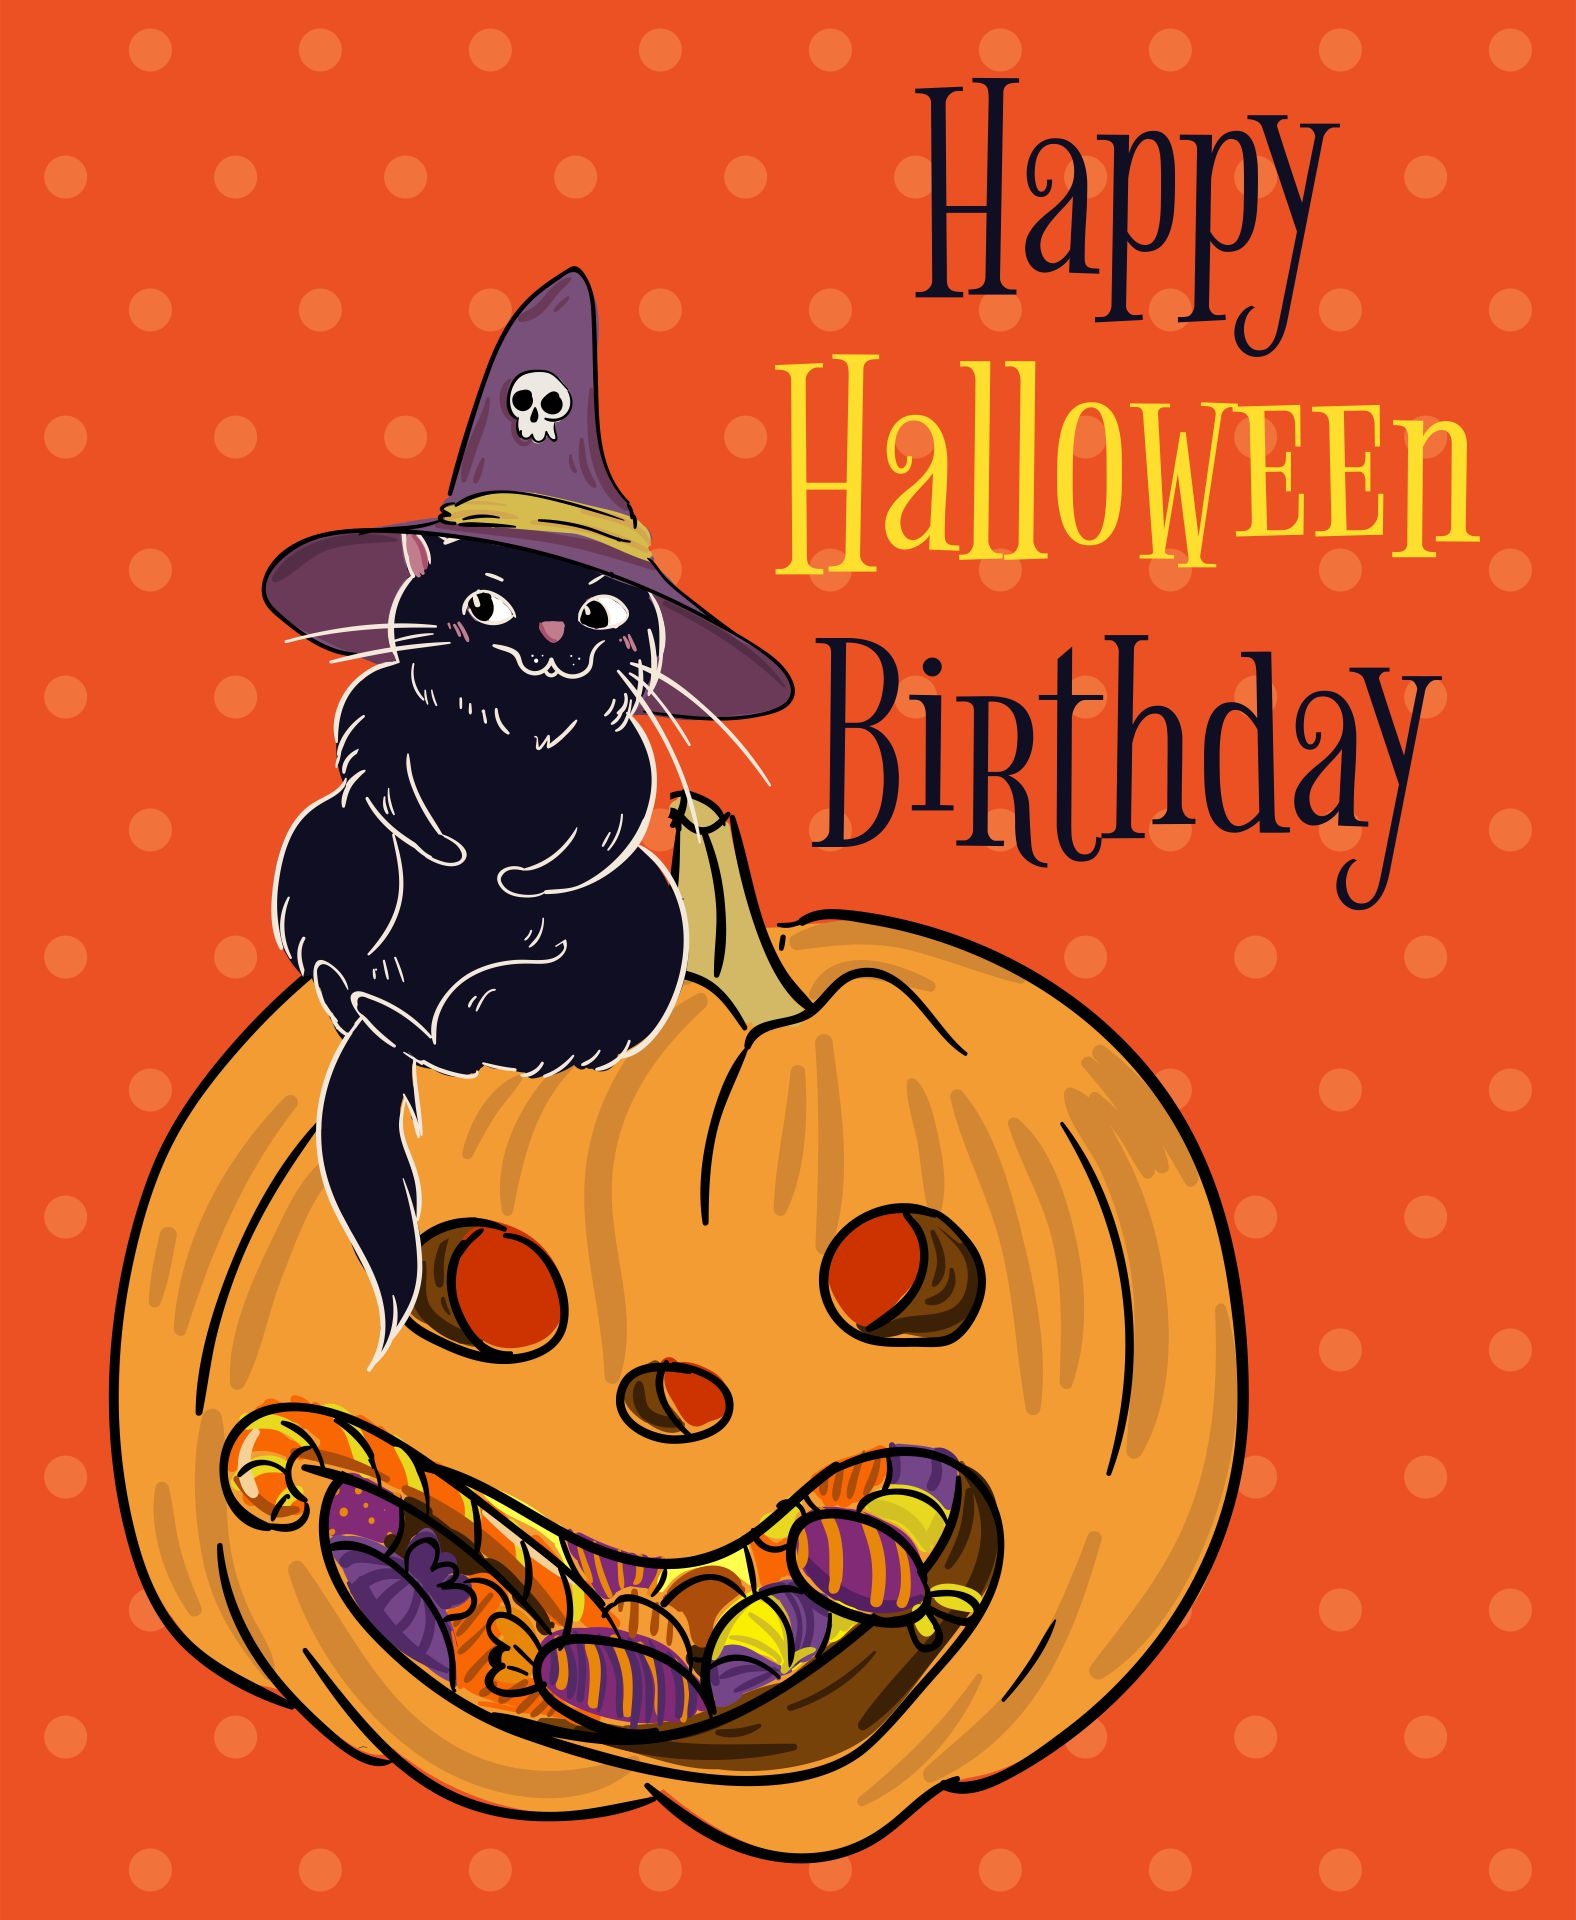 Vintage Halloween Printable Birthday Cards